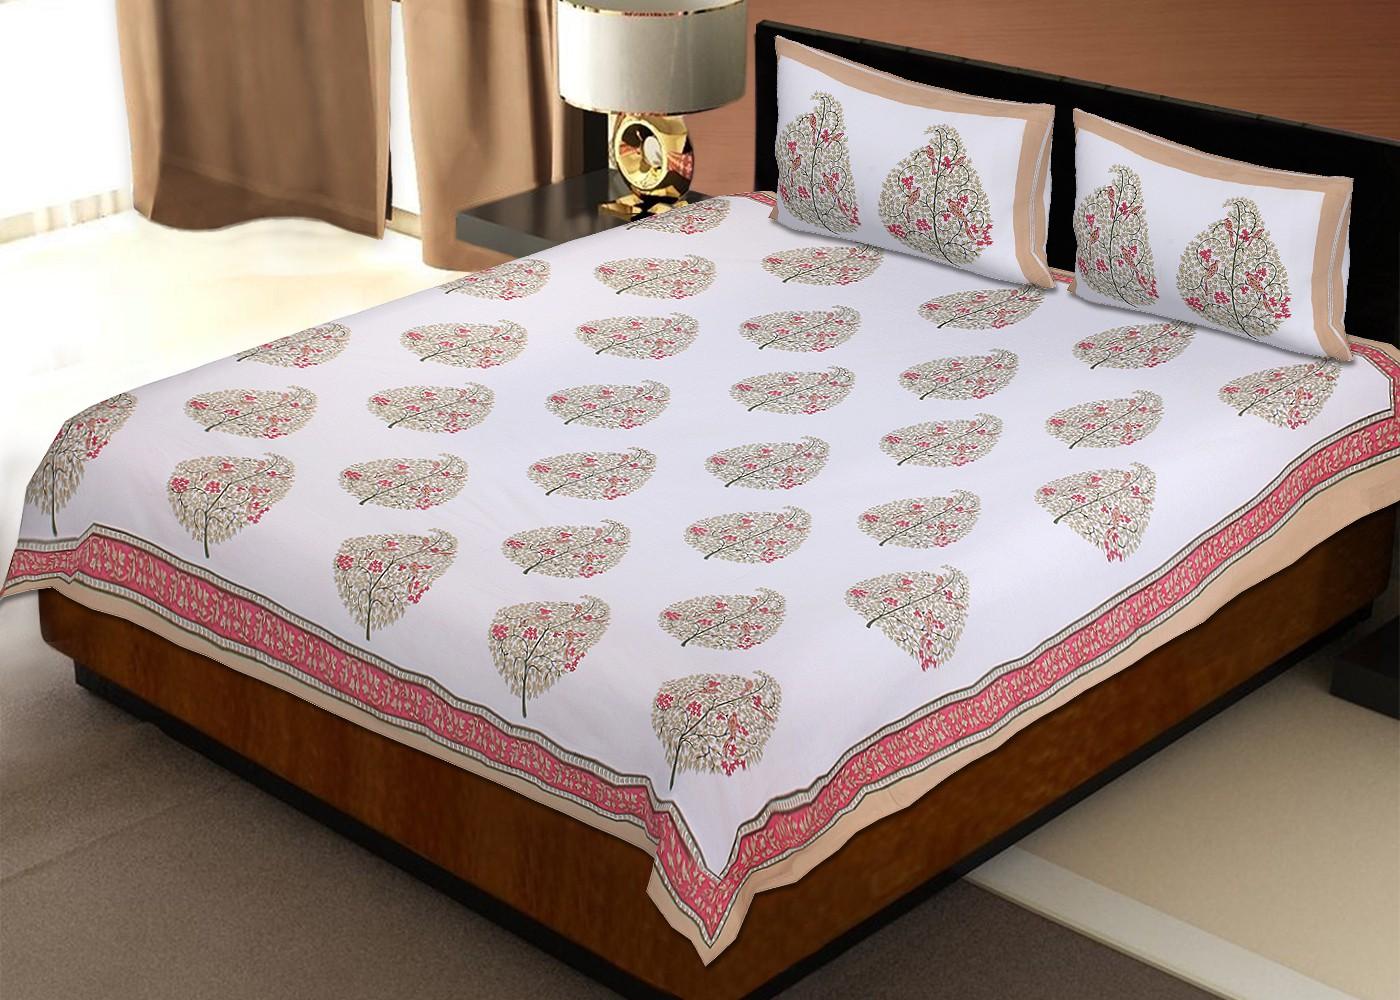 Rawaaz Cotton Abstract Queen sized Double Bedsheet